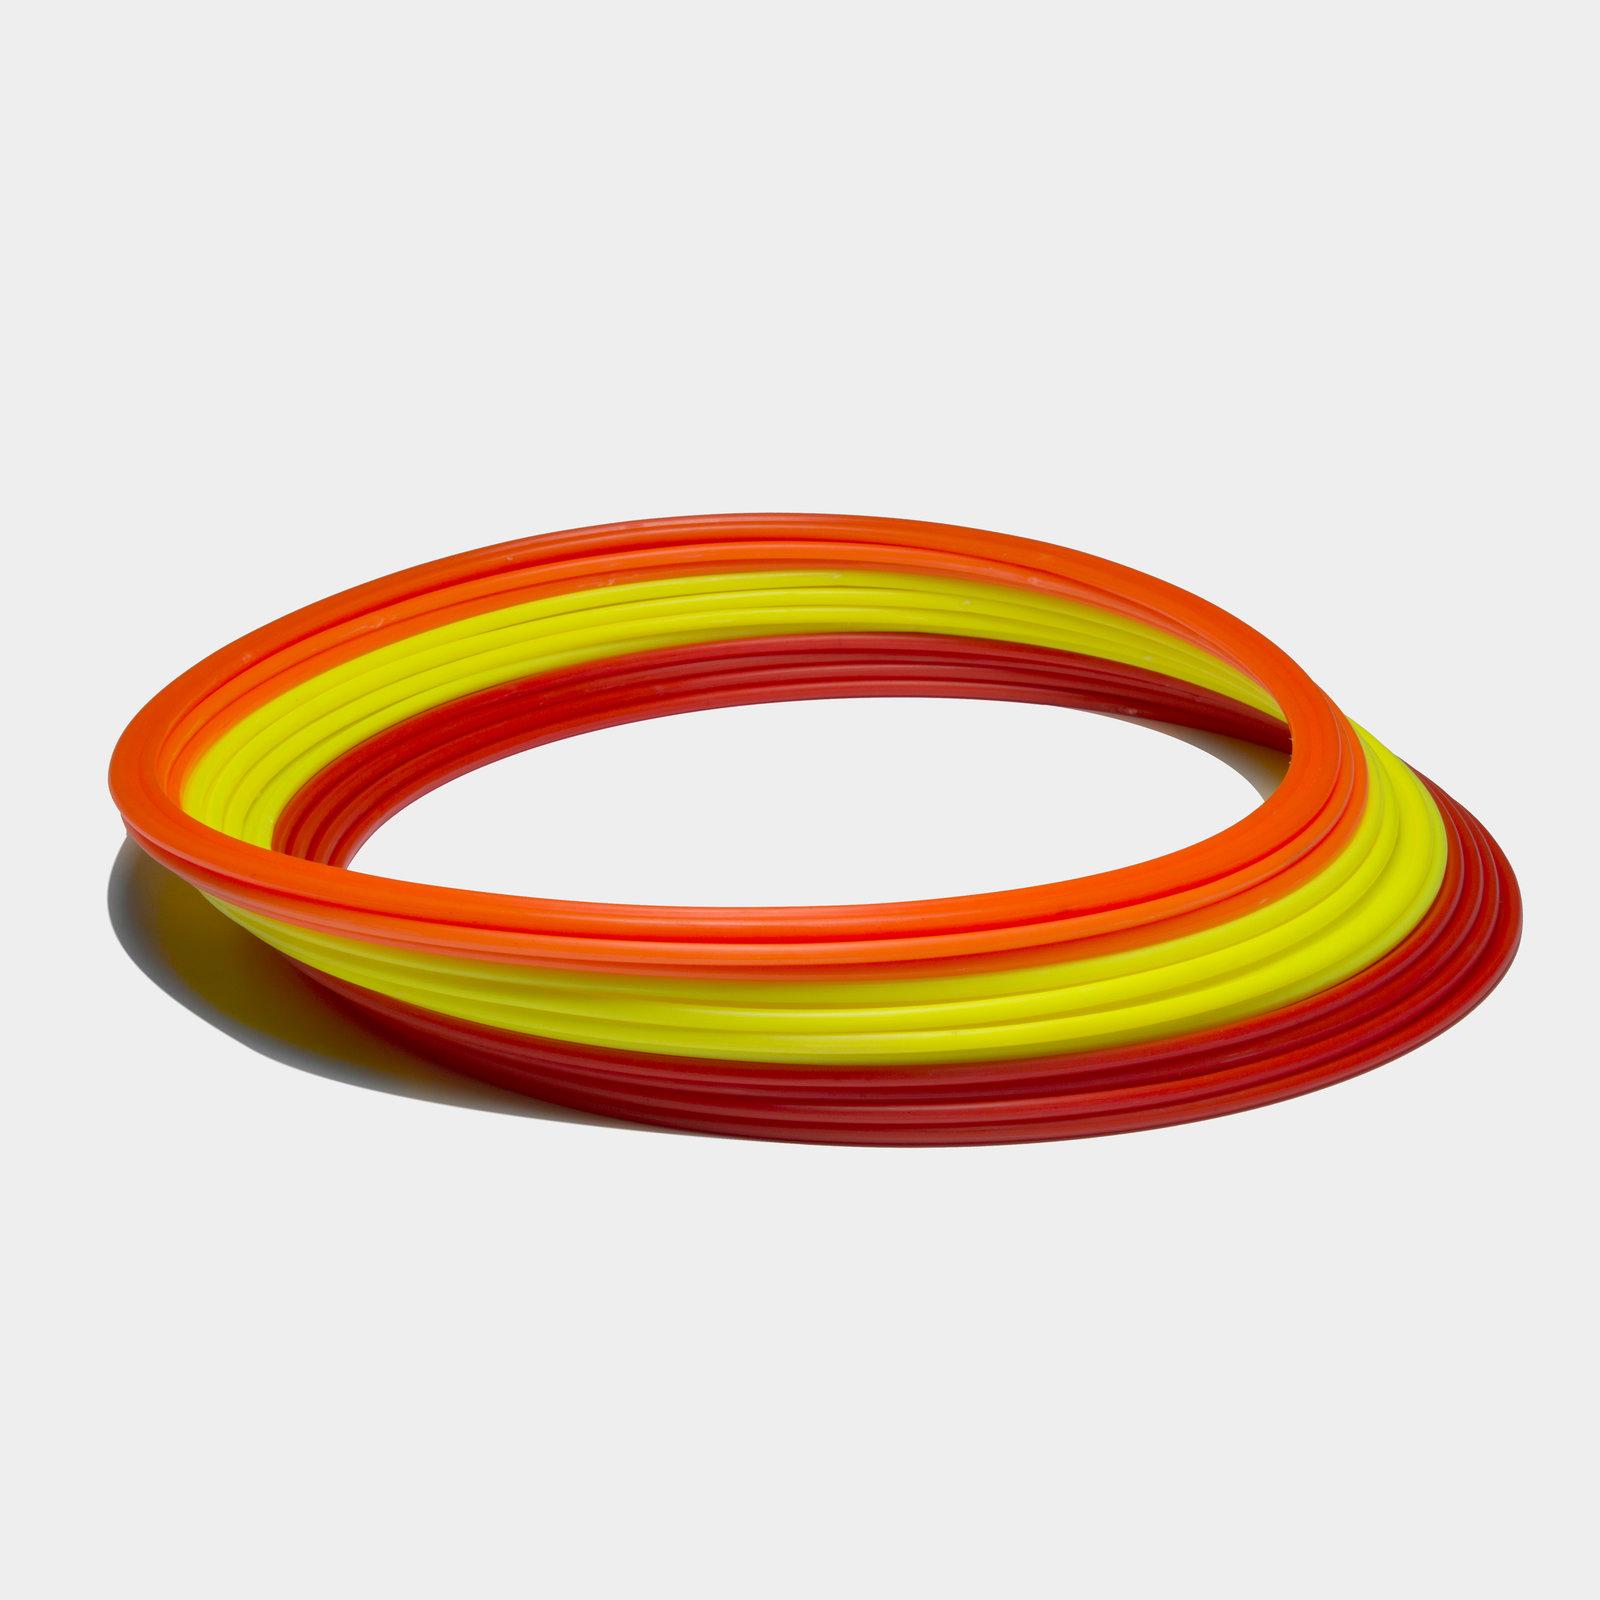 Image of 45cm Speed Rings Set of 12